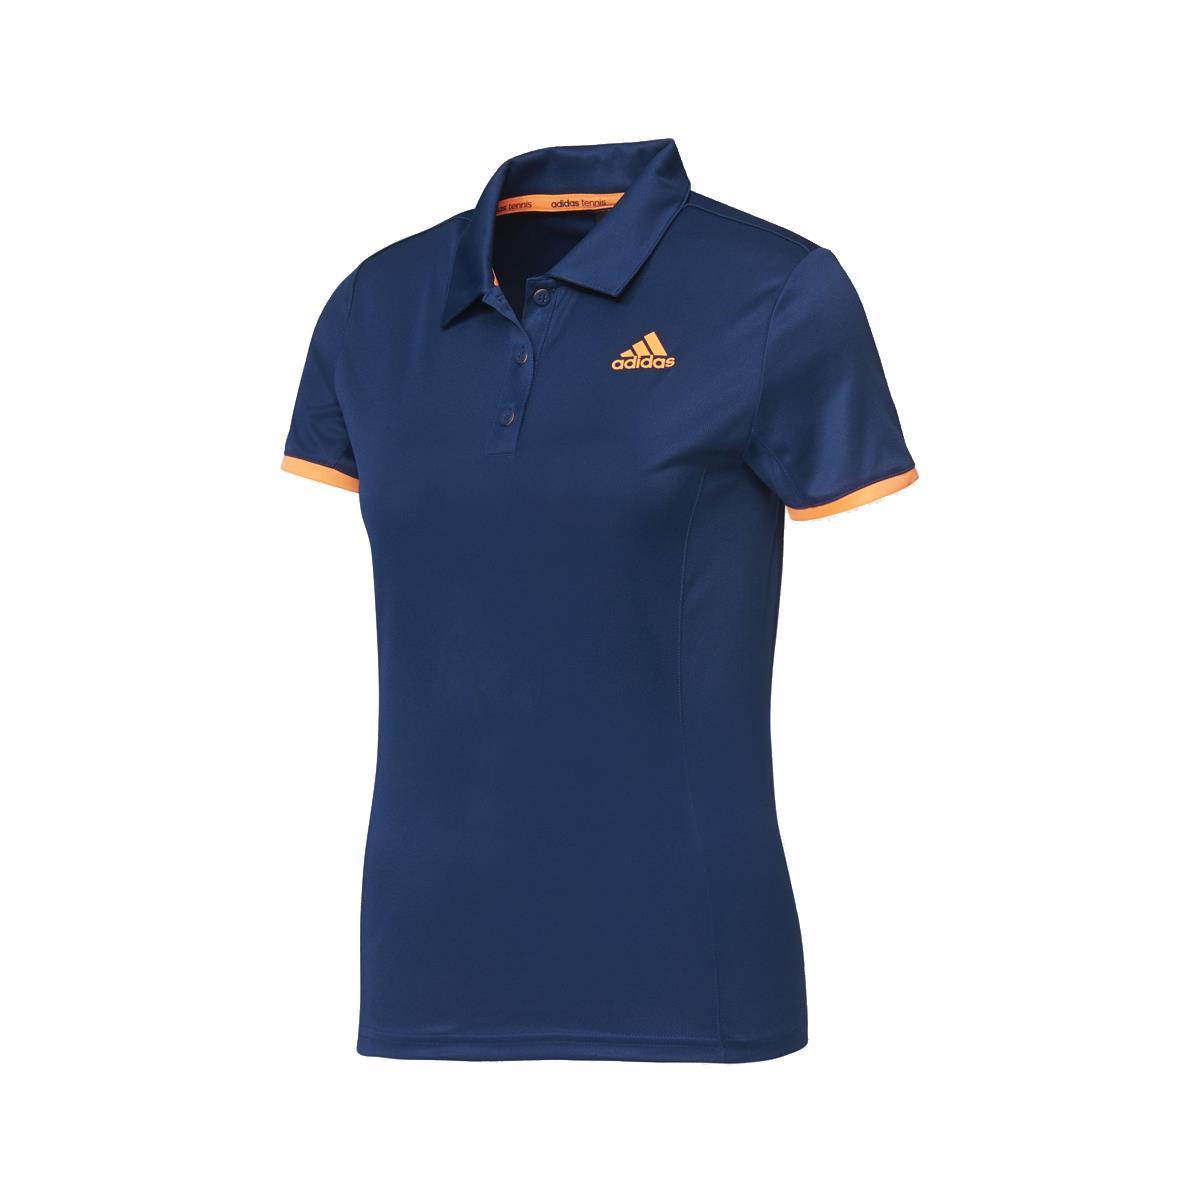 6fb240d730d24 Camiseta Polo Adidas Galaxy Court Feminina